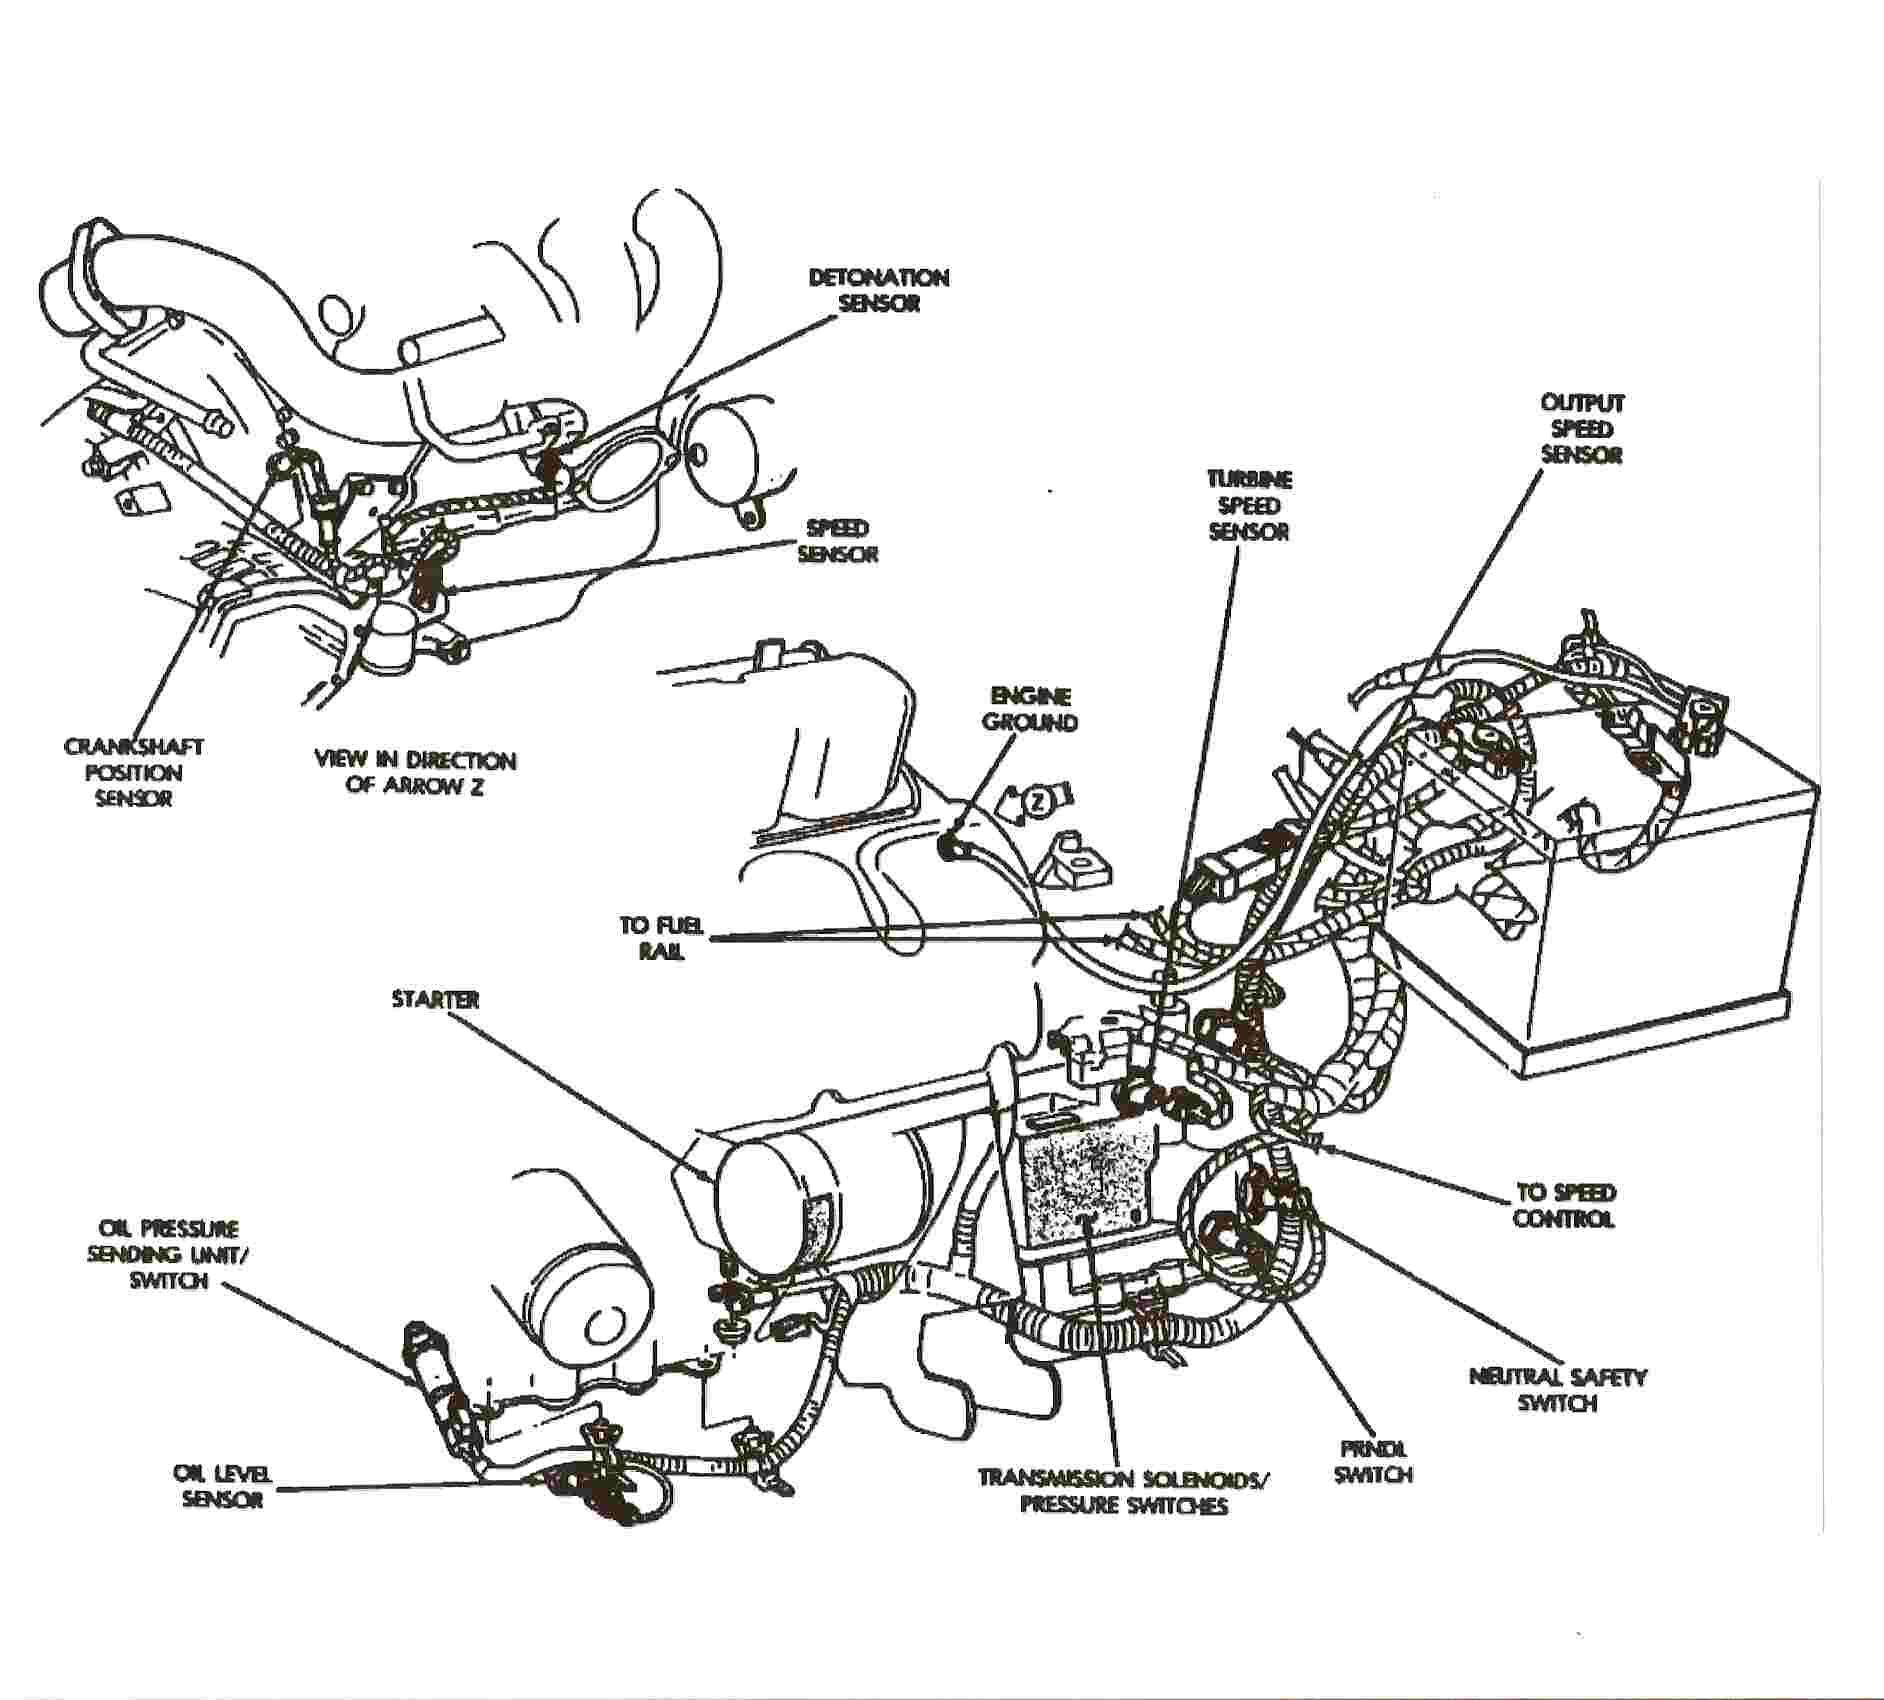 1993 Dodge W150 Wiring Diagram Diagrams 1991 Dynasty Engine U2022 For Free D150 Lifted